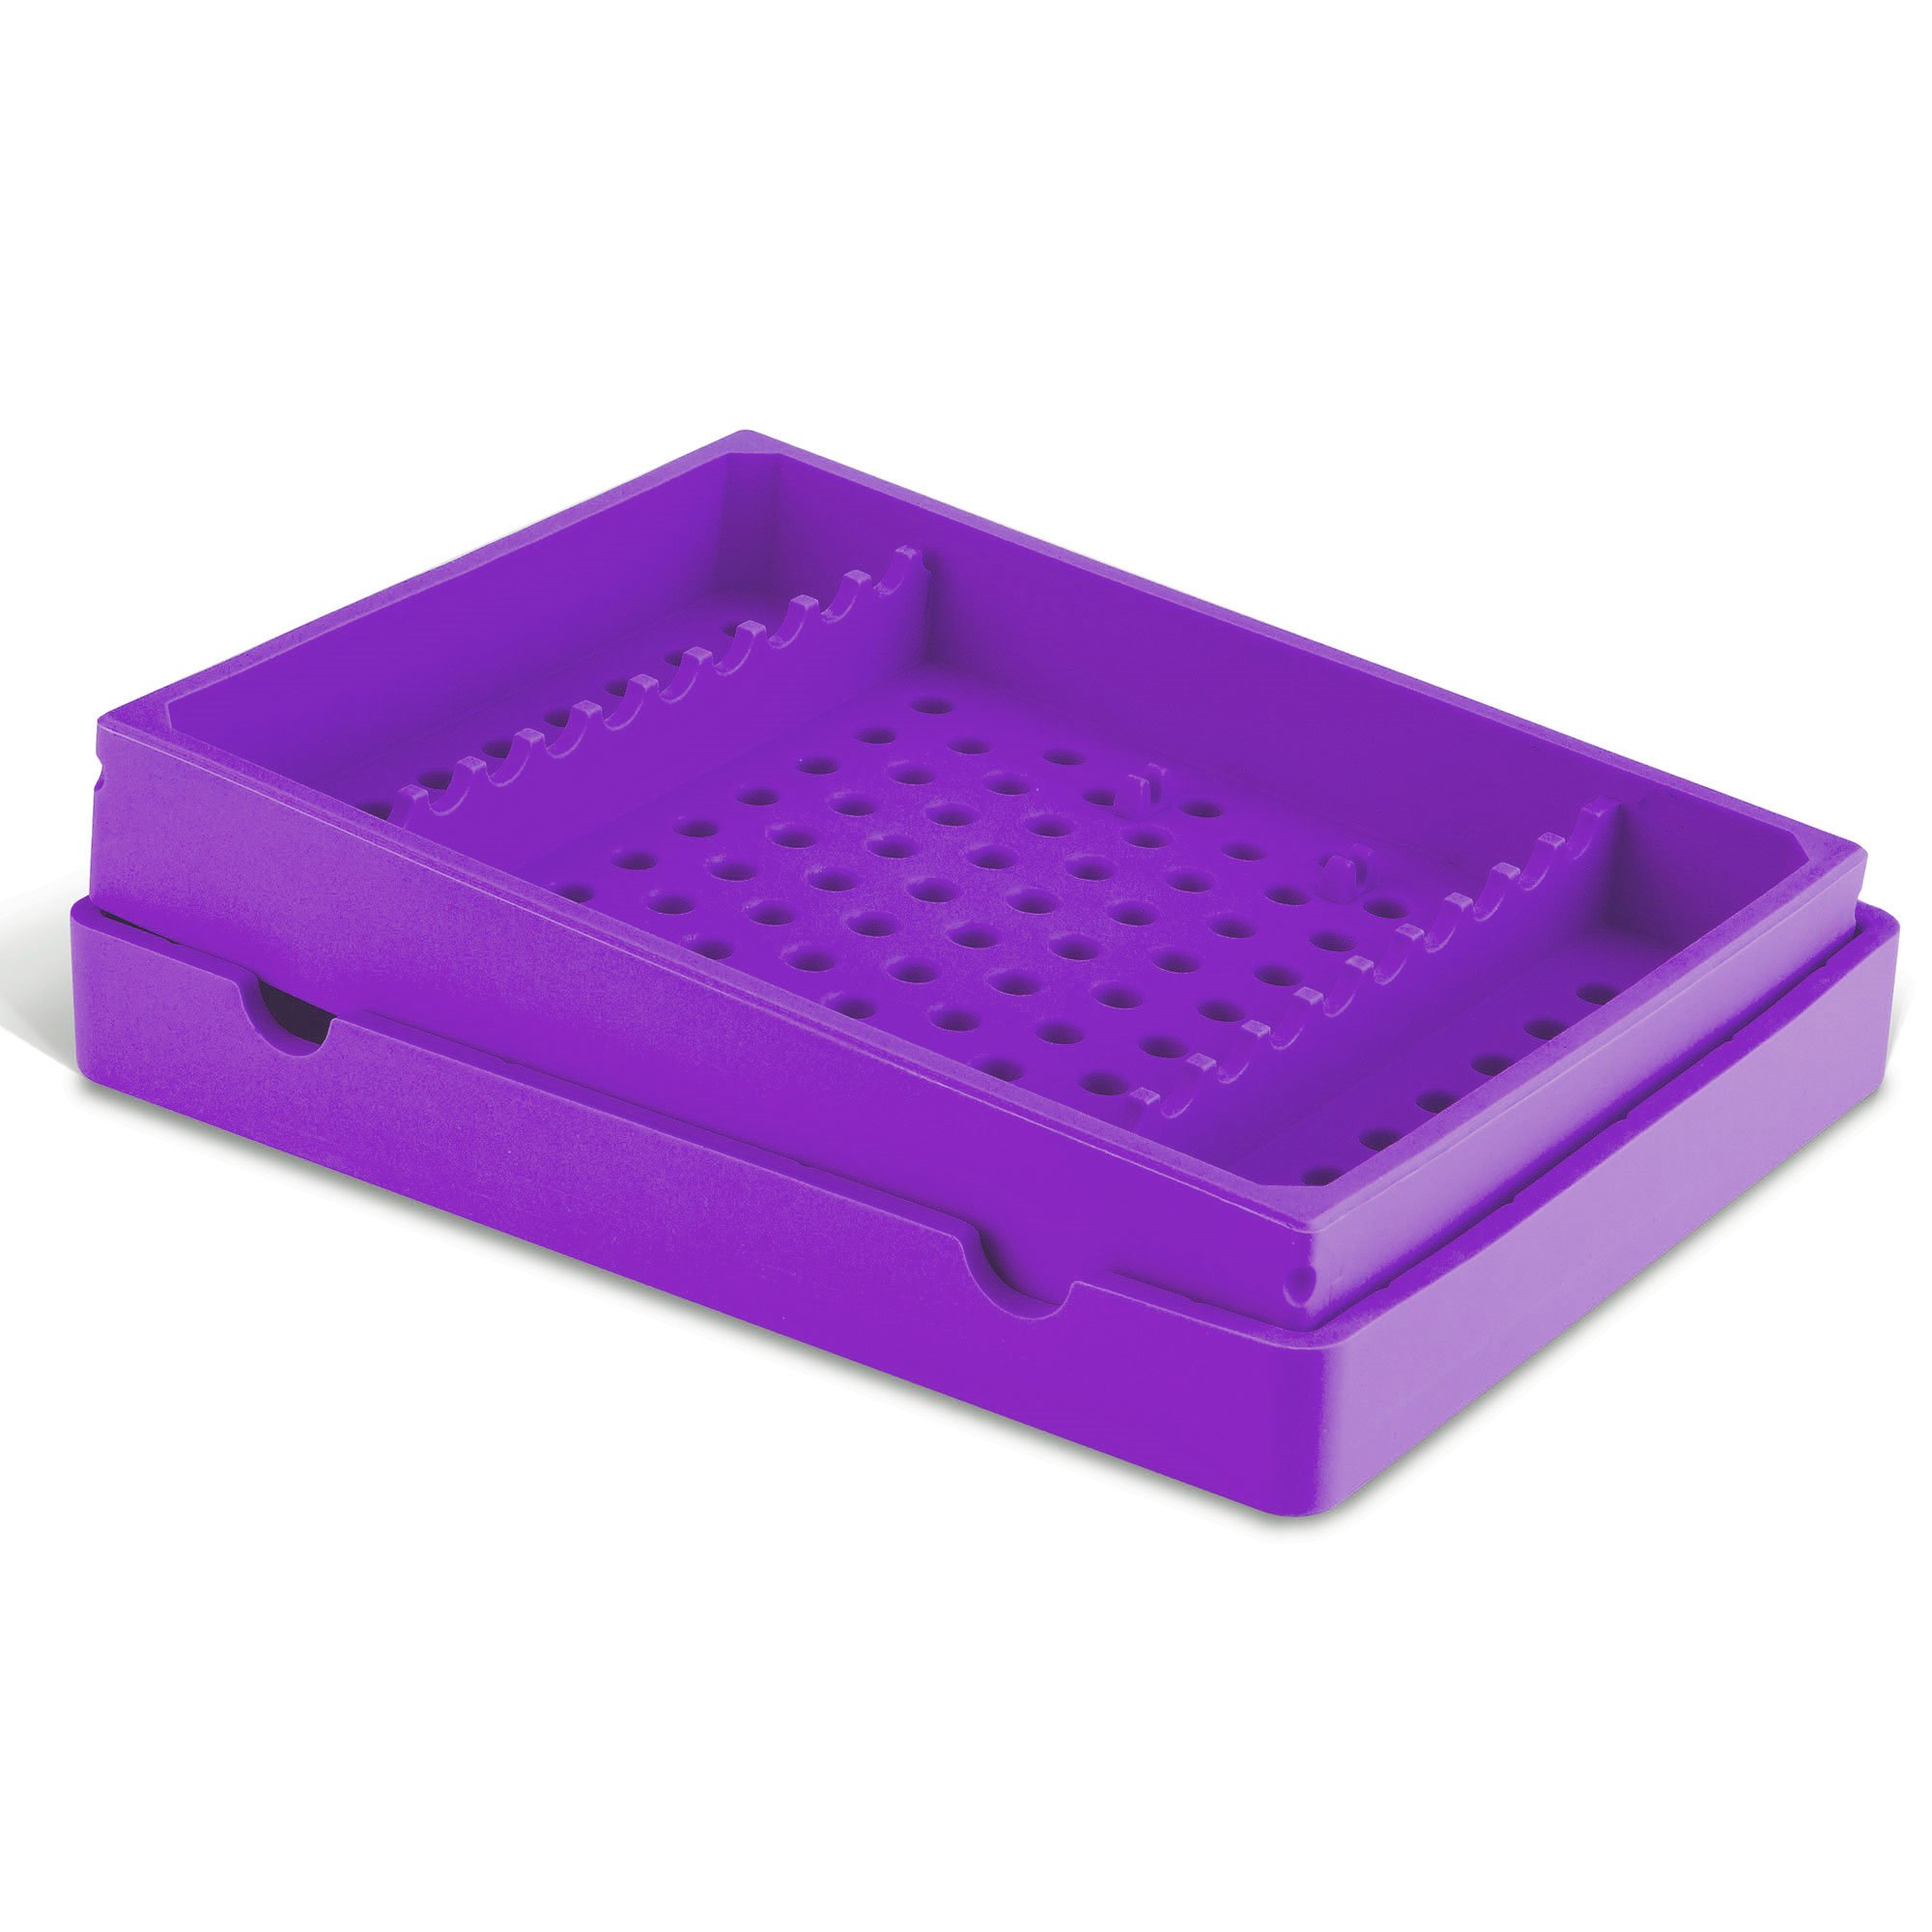 Practicon 7039771 PUR Cool Cassette 10 Instrument Container, Purple